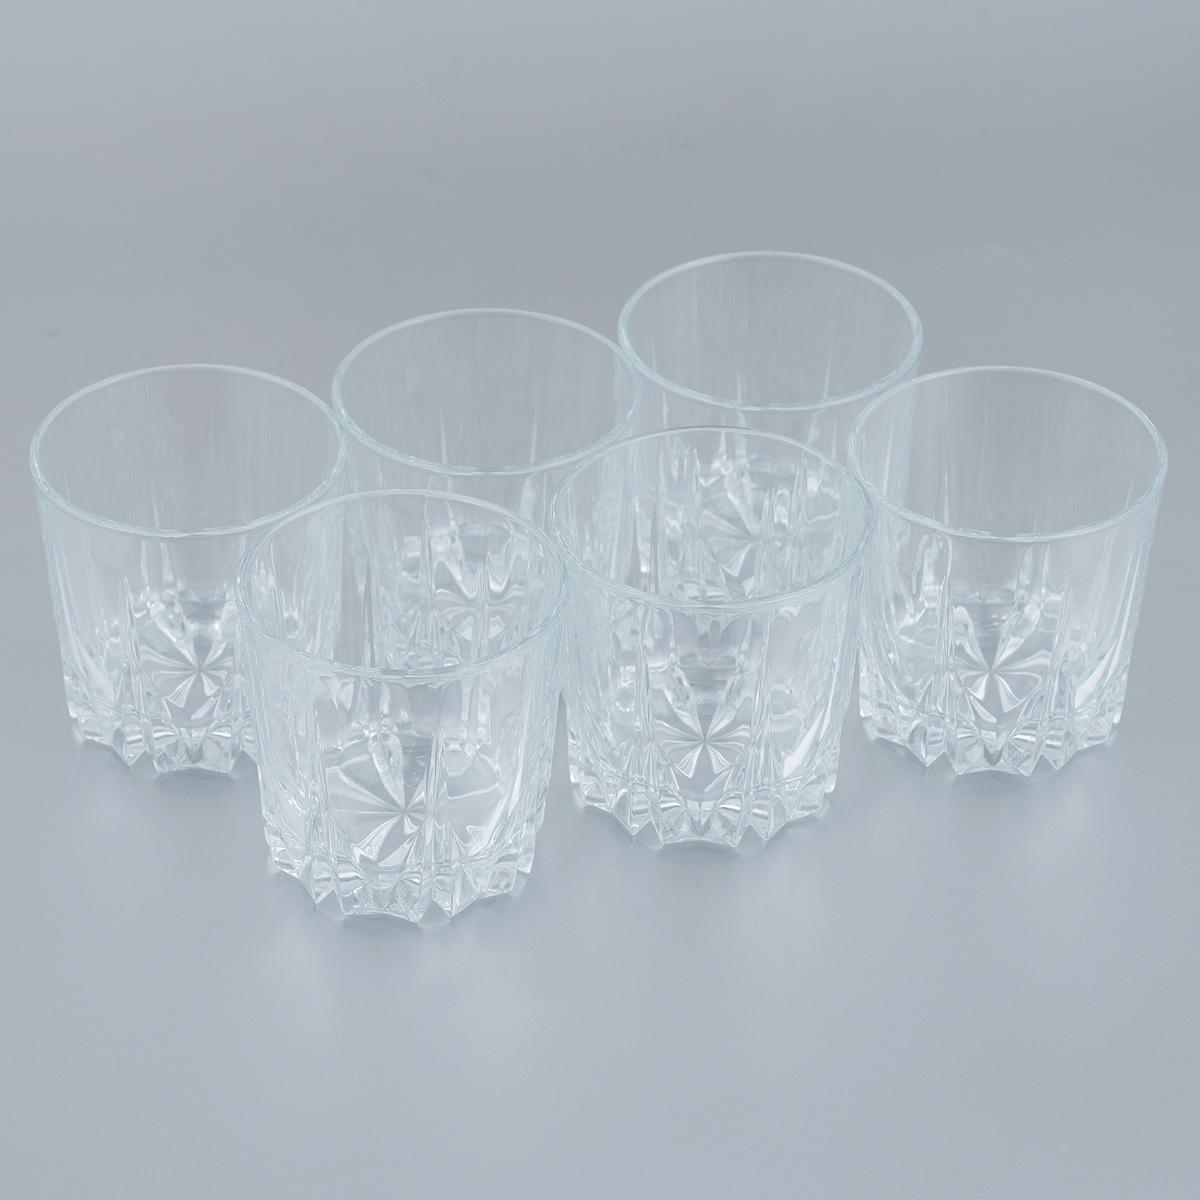 Набор стаканов для сока Pasabahce Карат, 200 мл, 6 шт набор стаканов для сока pasabahce tango 6 преметов